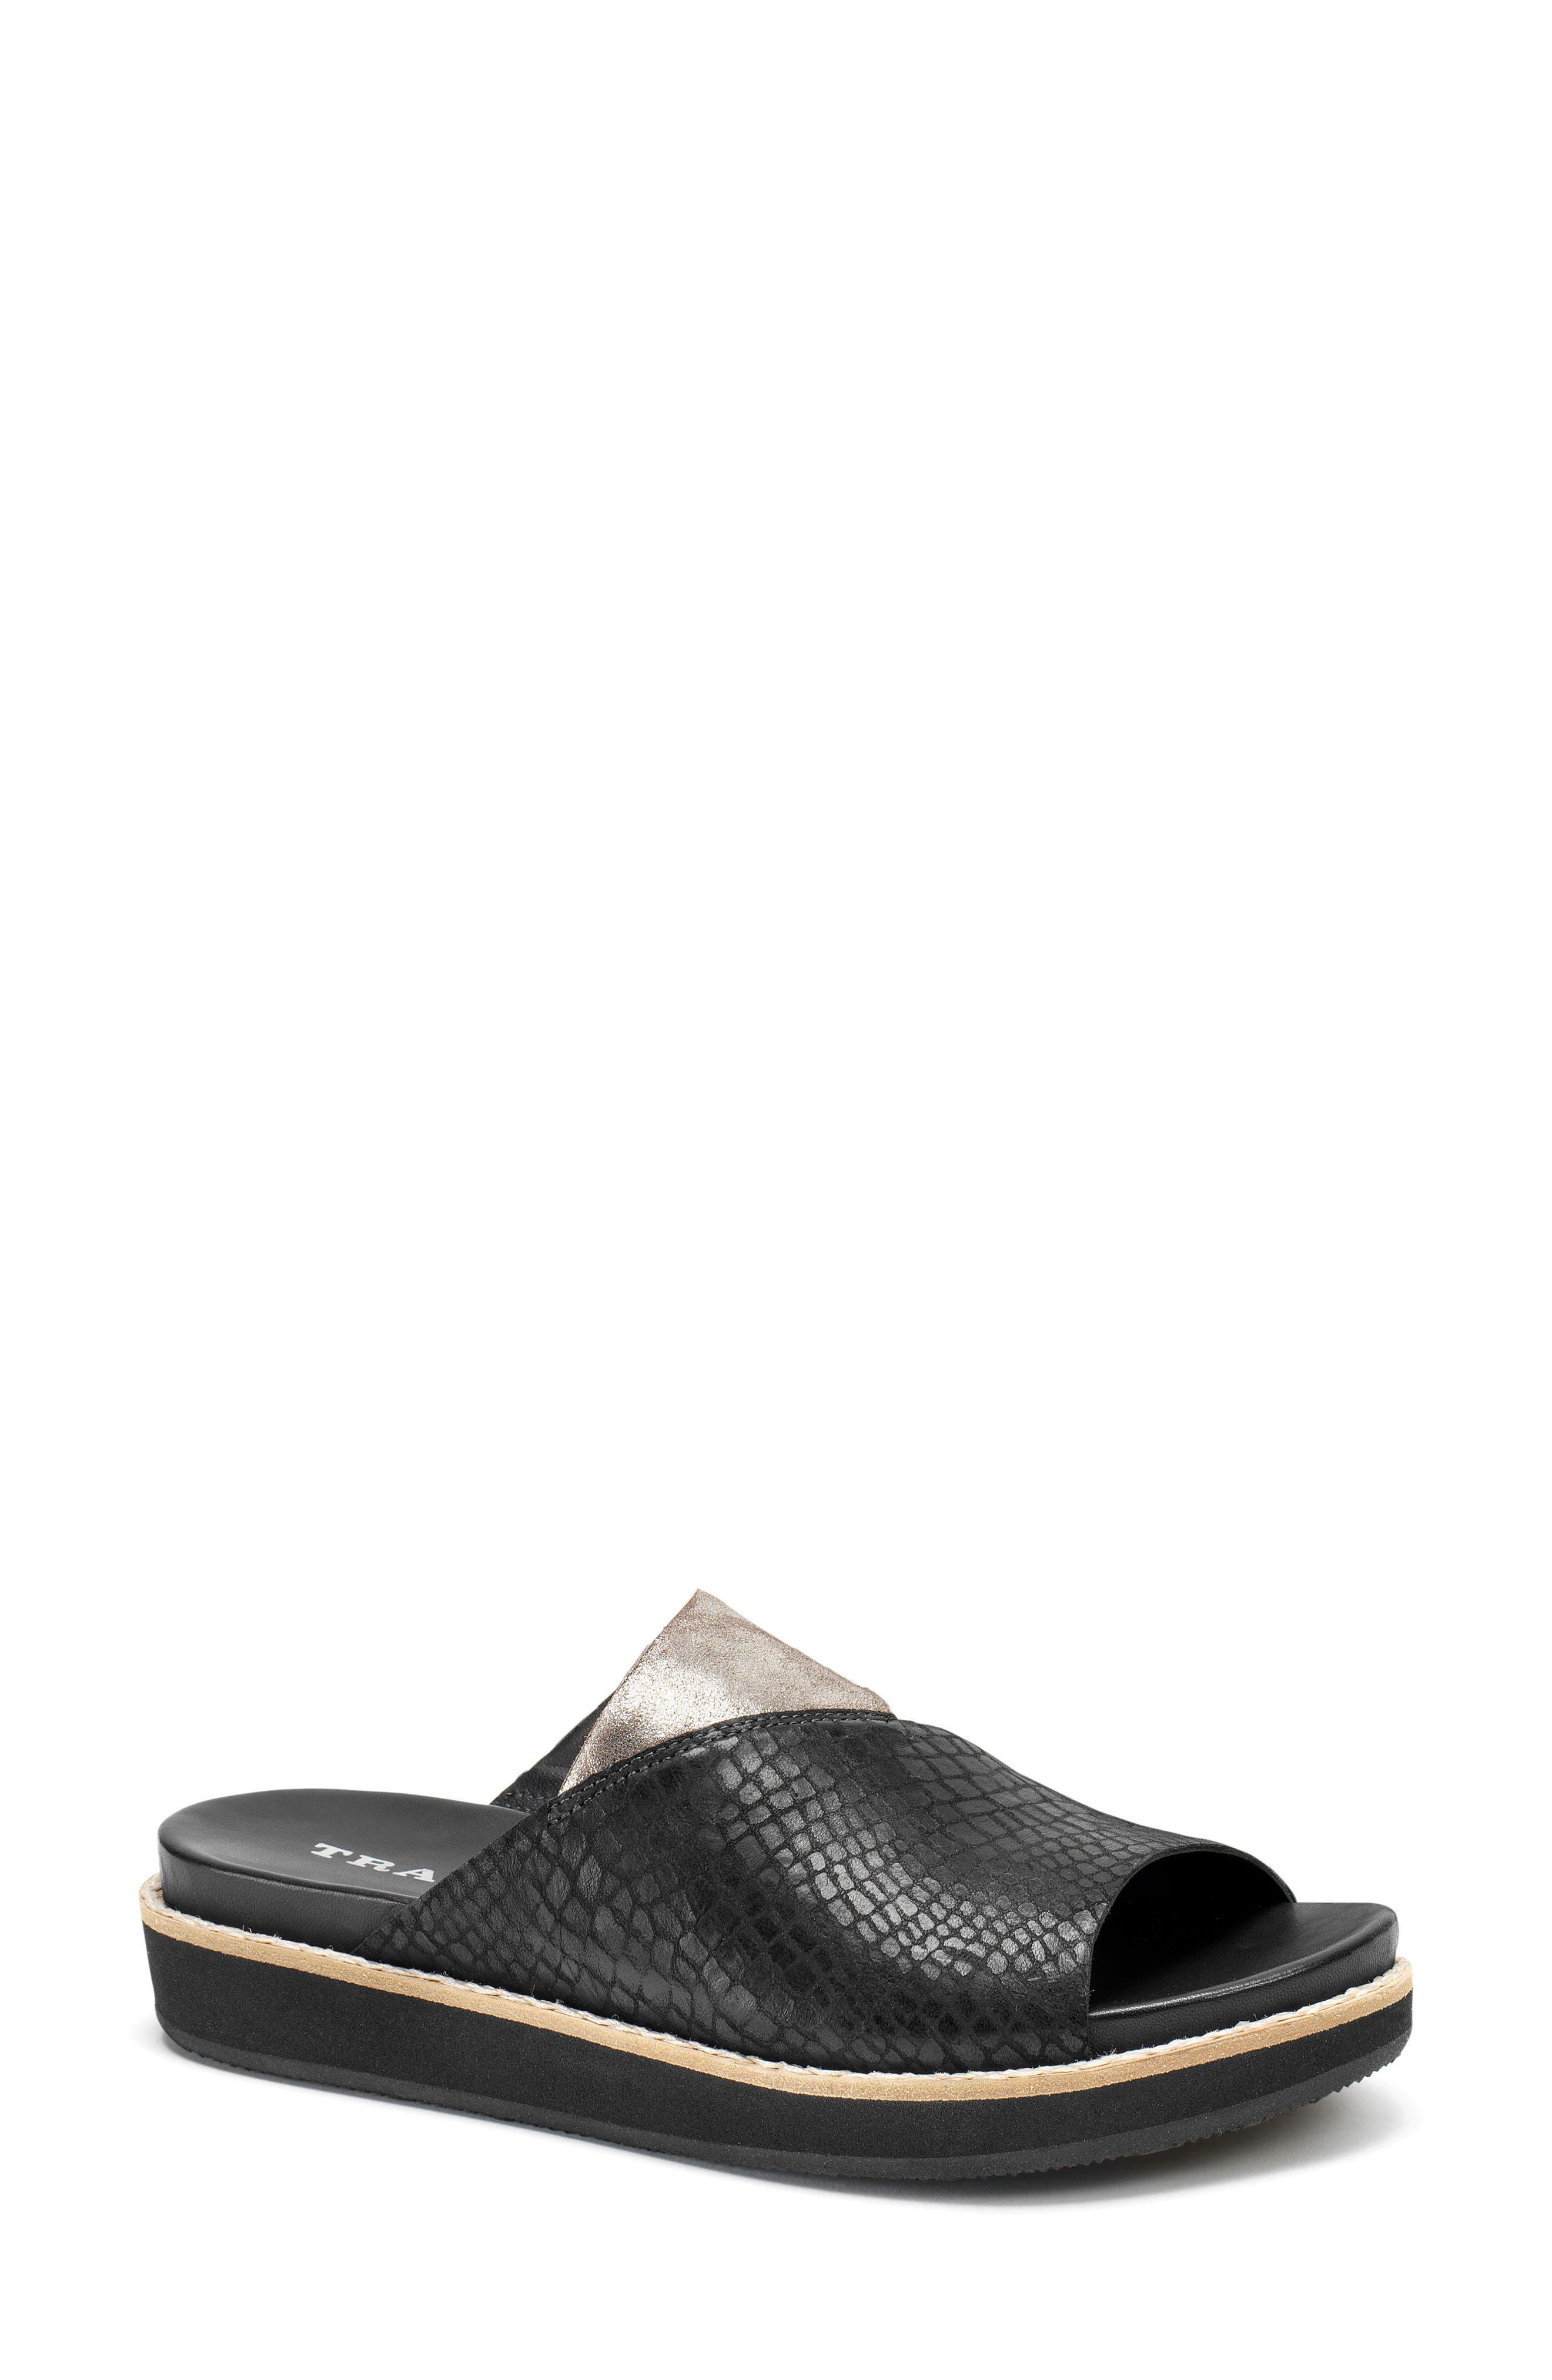 Codi Sandal,                         Main,                         color, Black Embossed Leather